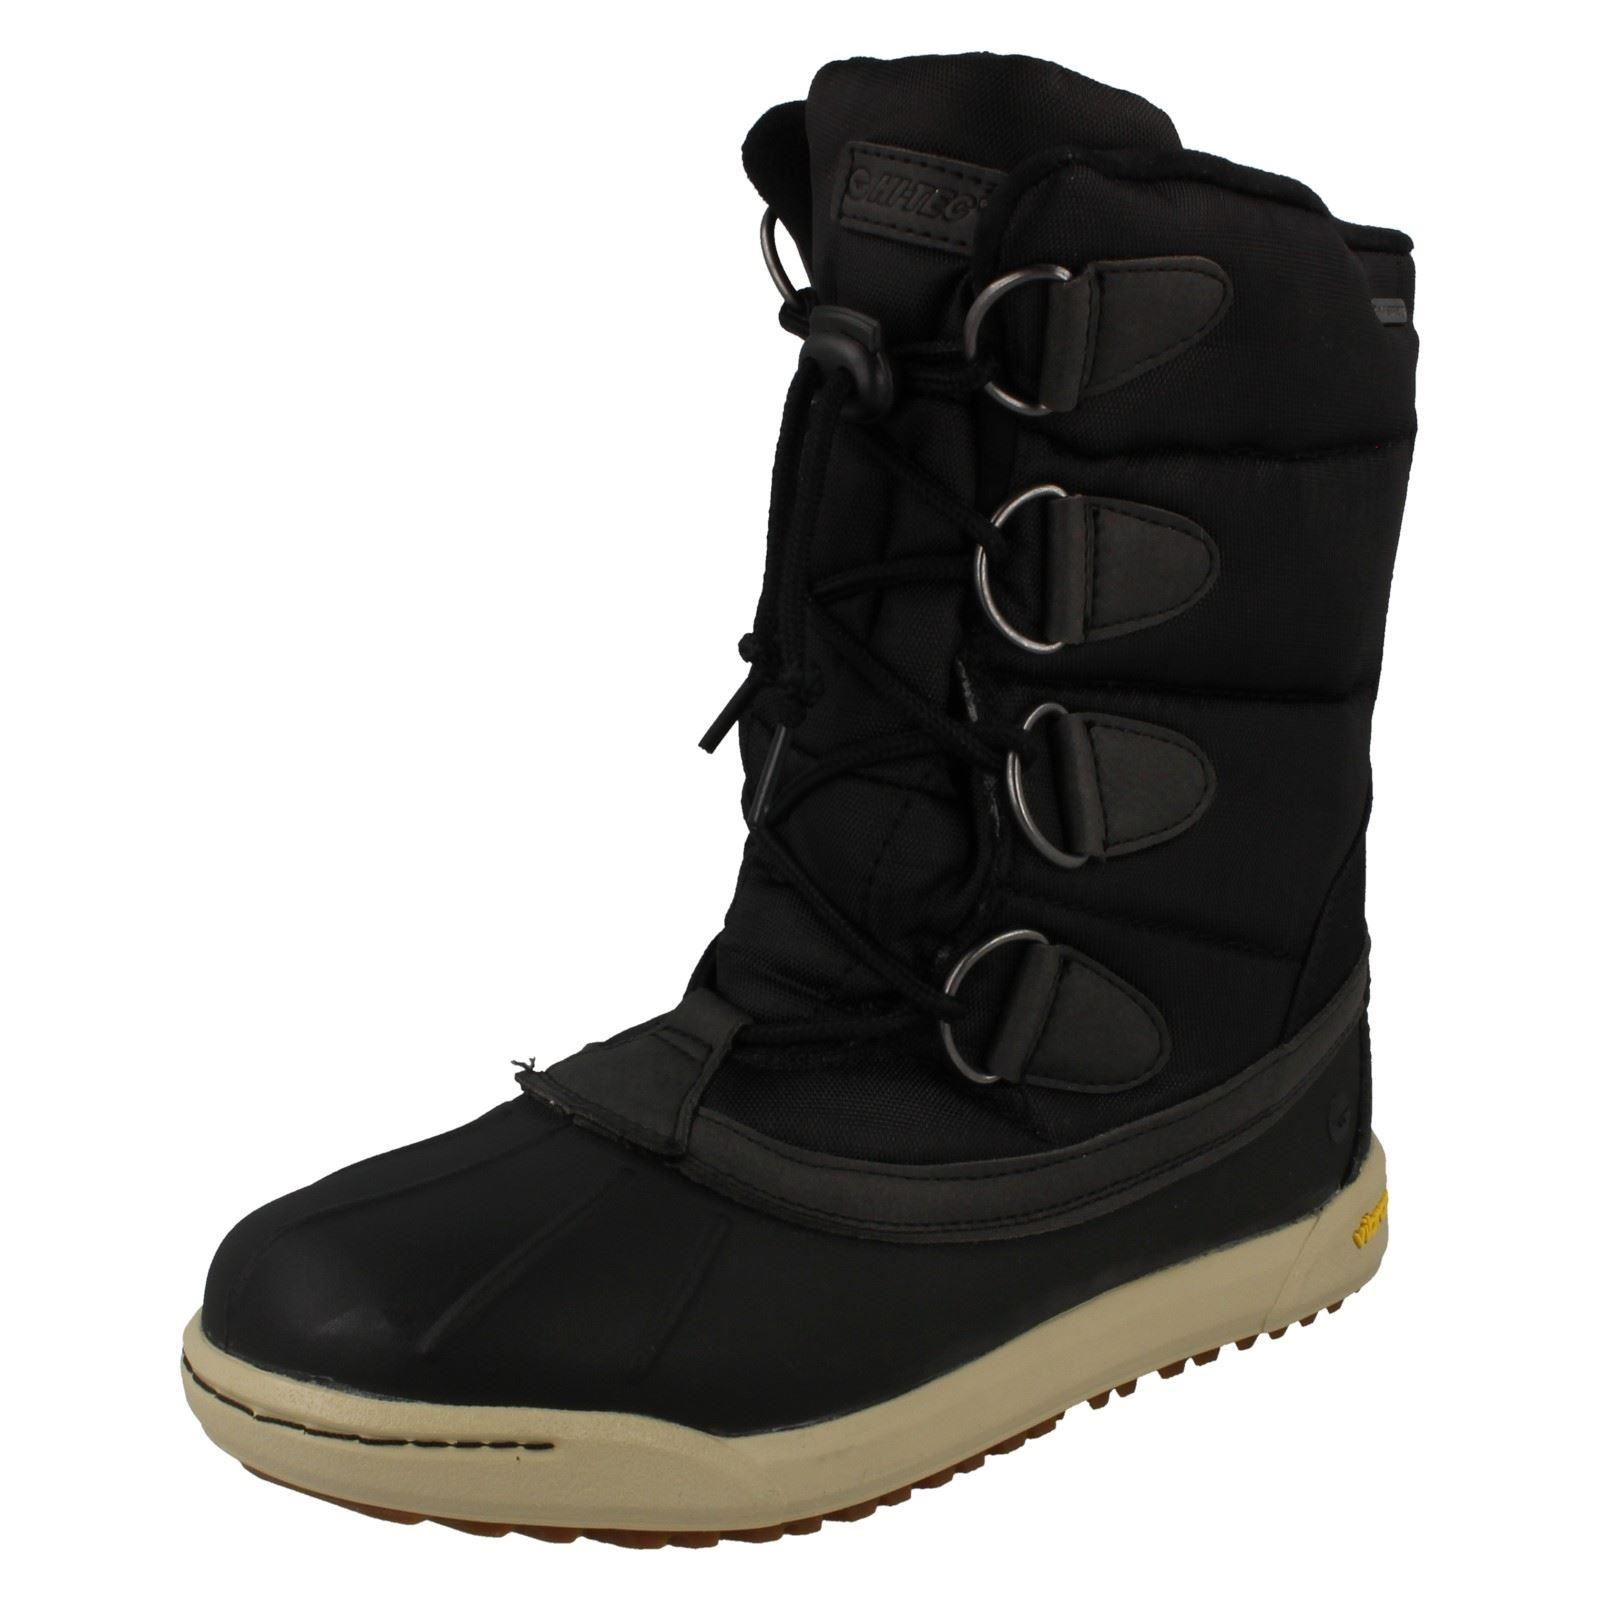 Hi Tec Snow Boots Ladies | Homewood Mountain Ski Resort